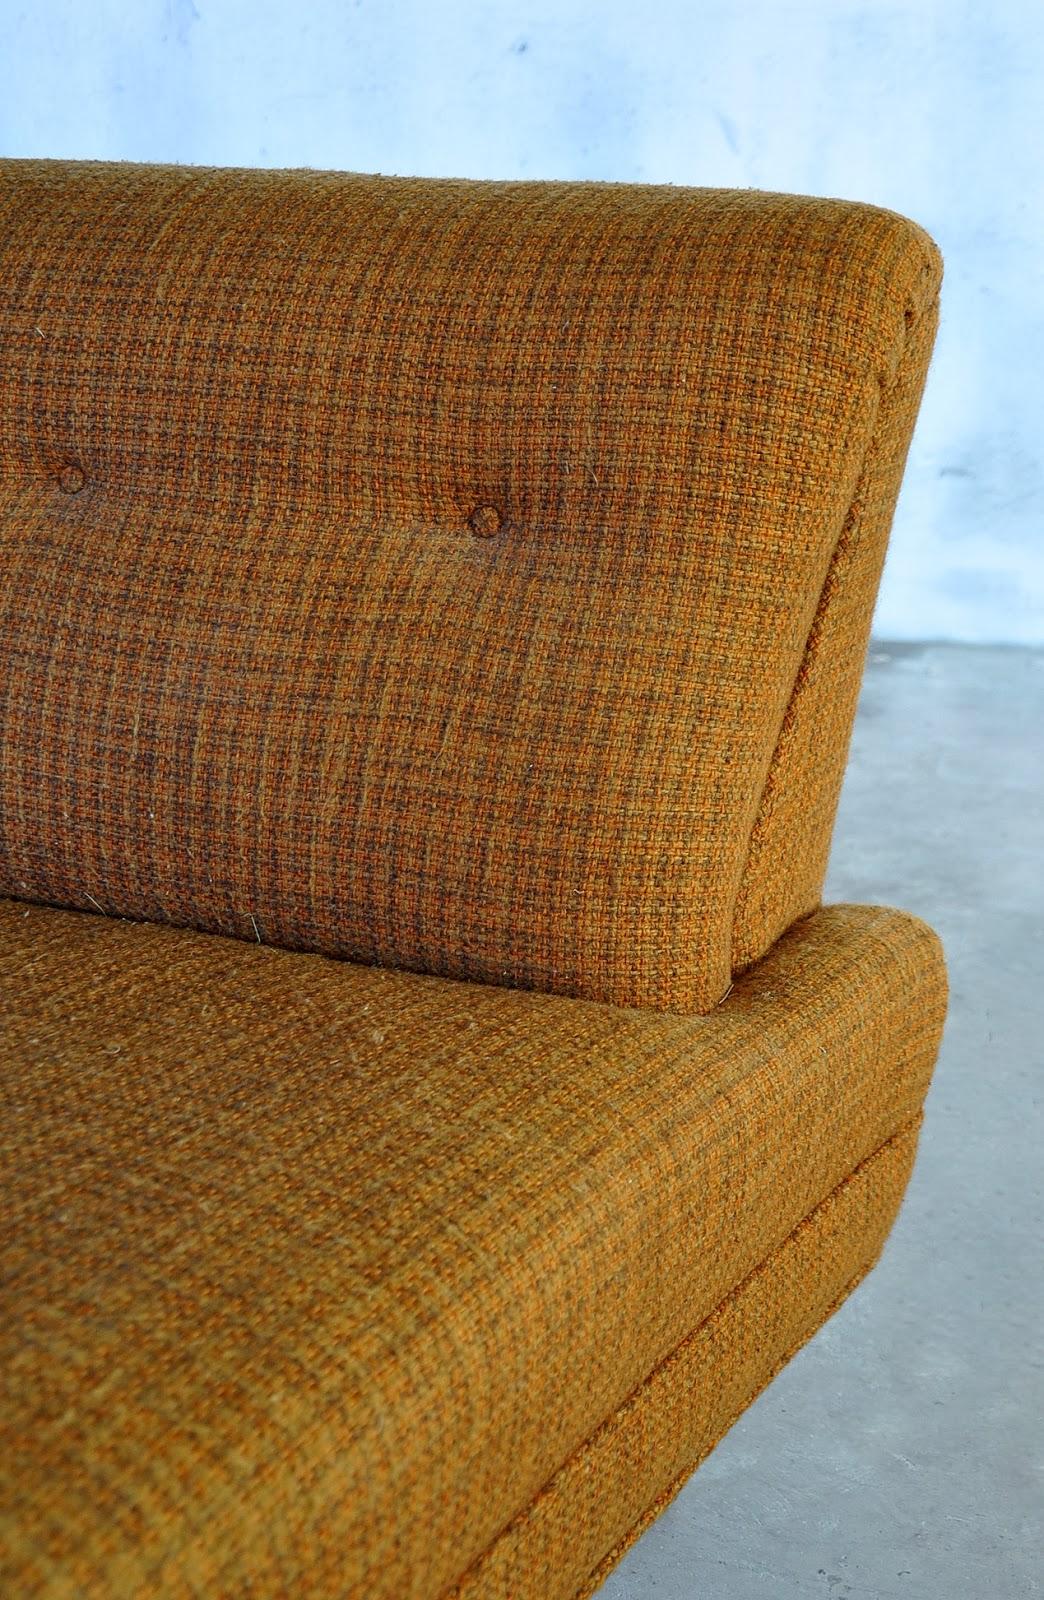 SELECT MODERN: Mid Century Modern Sectional Sofa